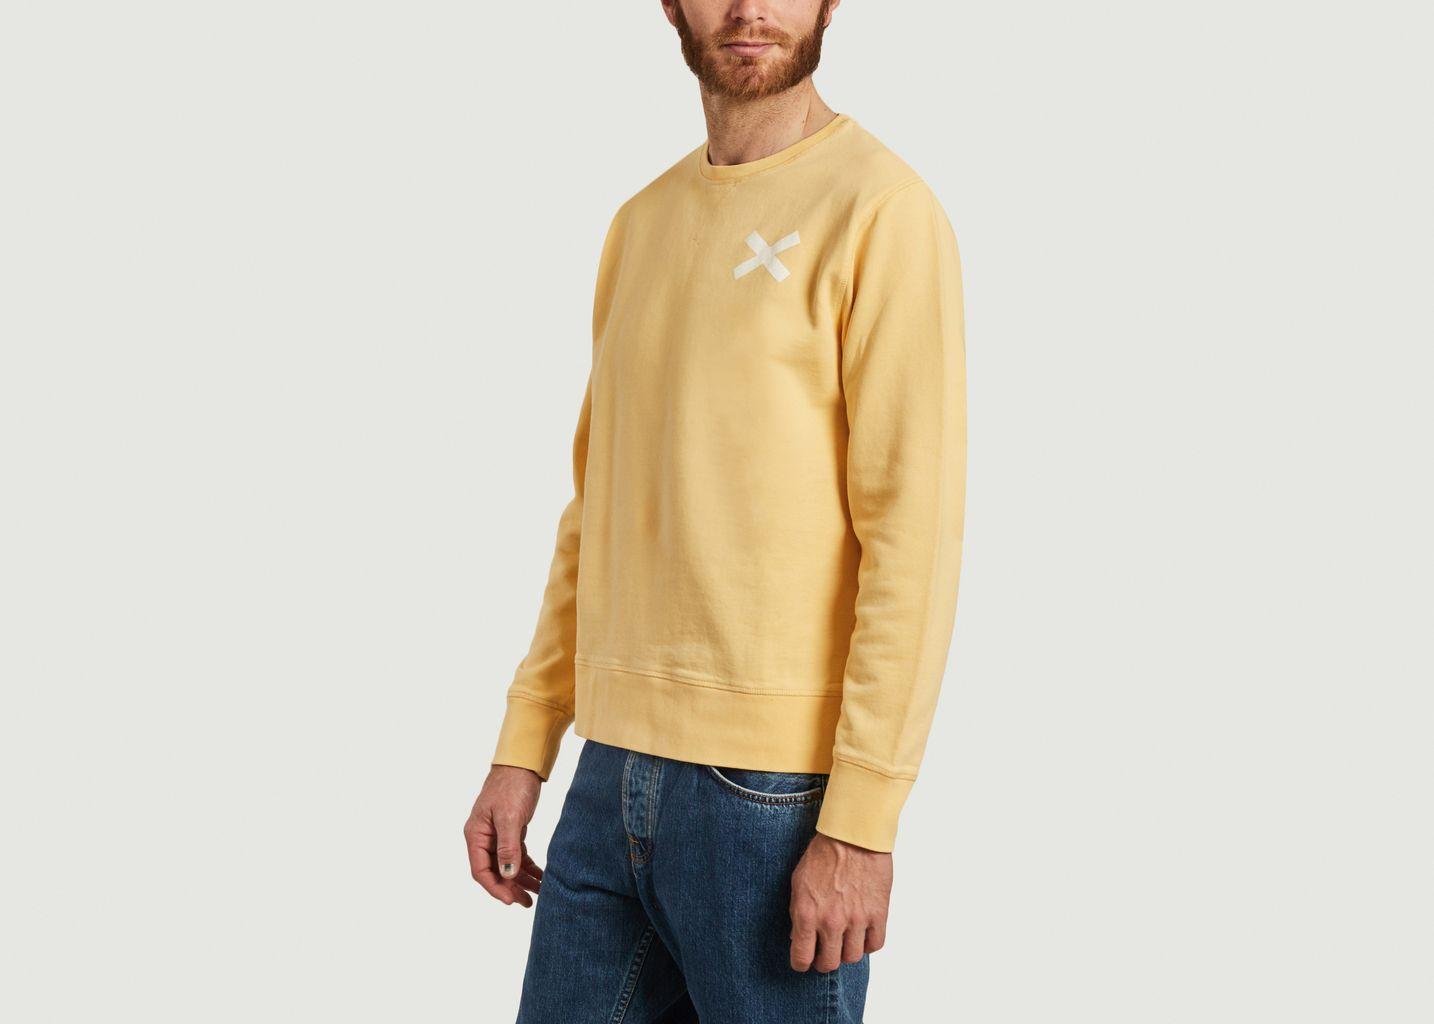 Sweatshirt Cross - Edmmond Studios